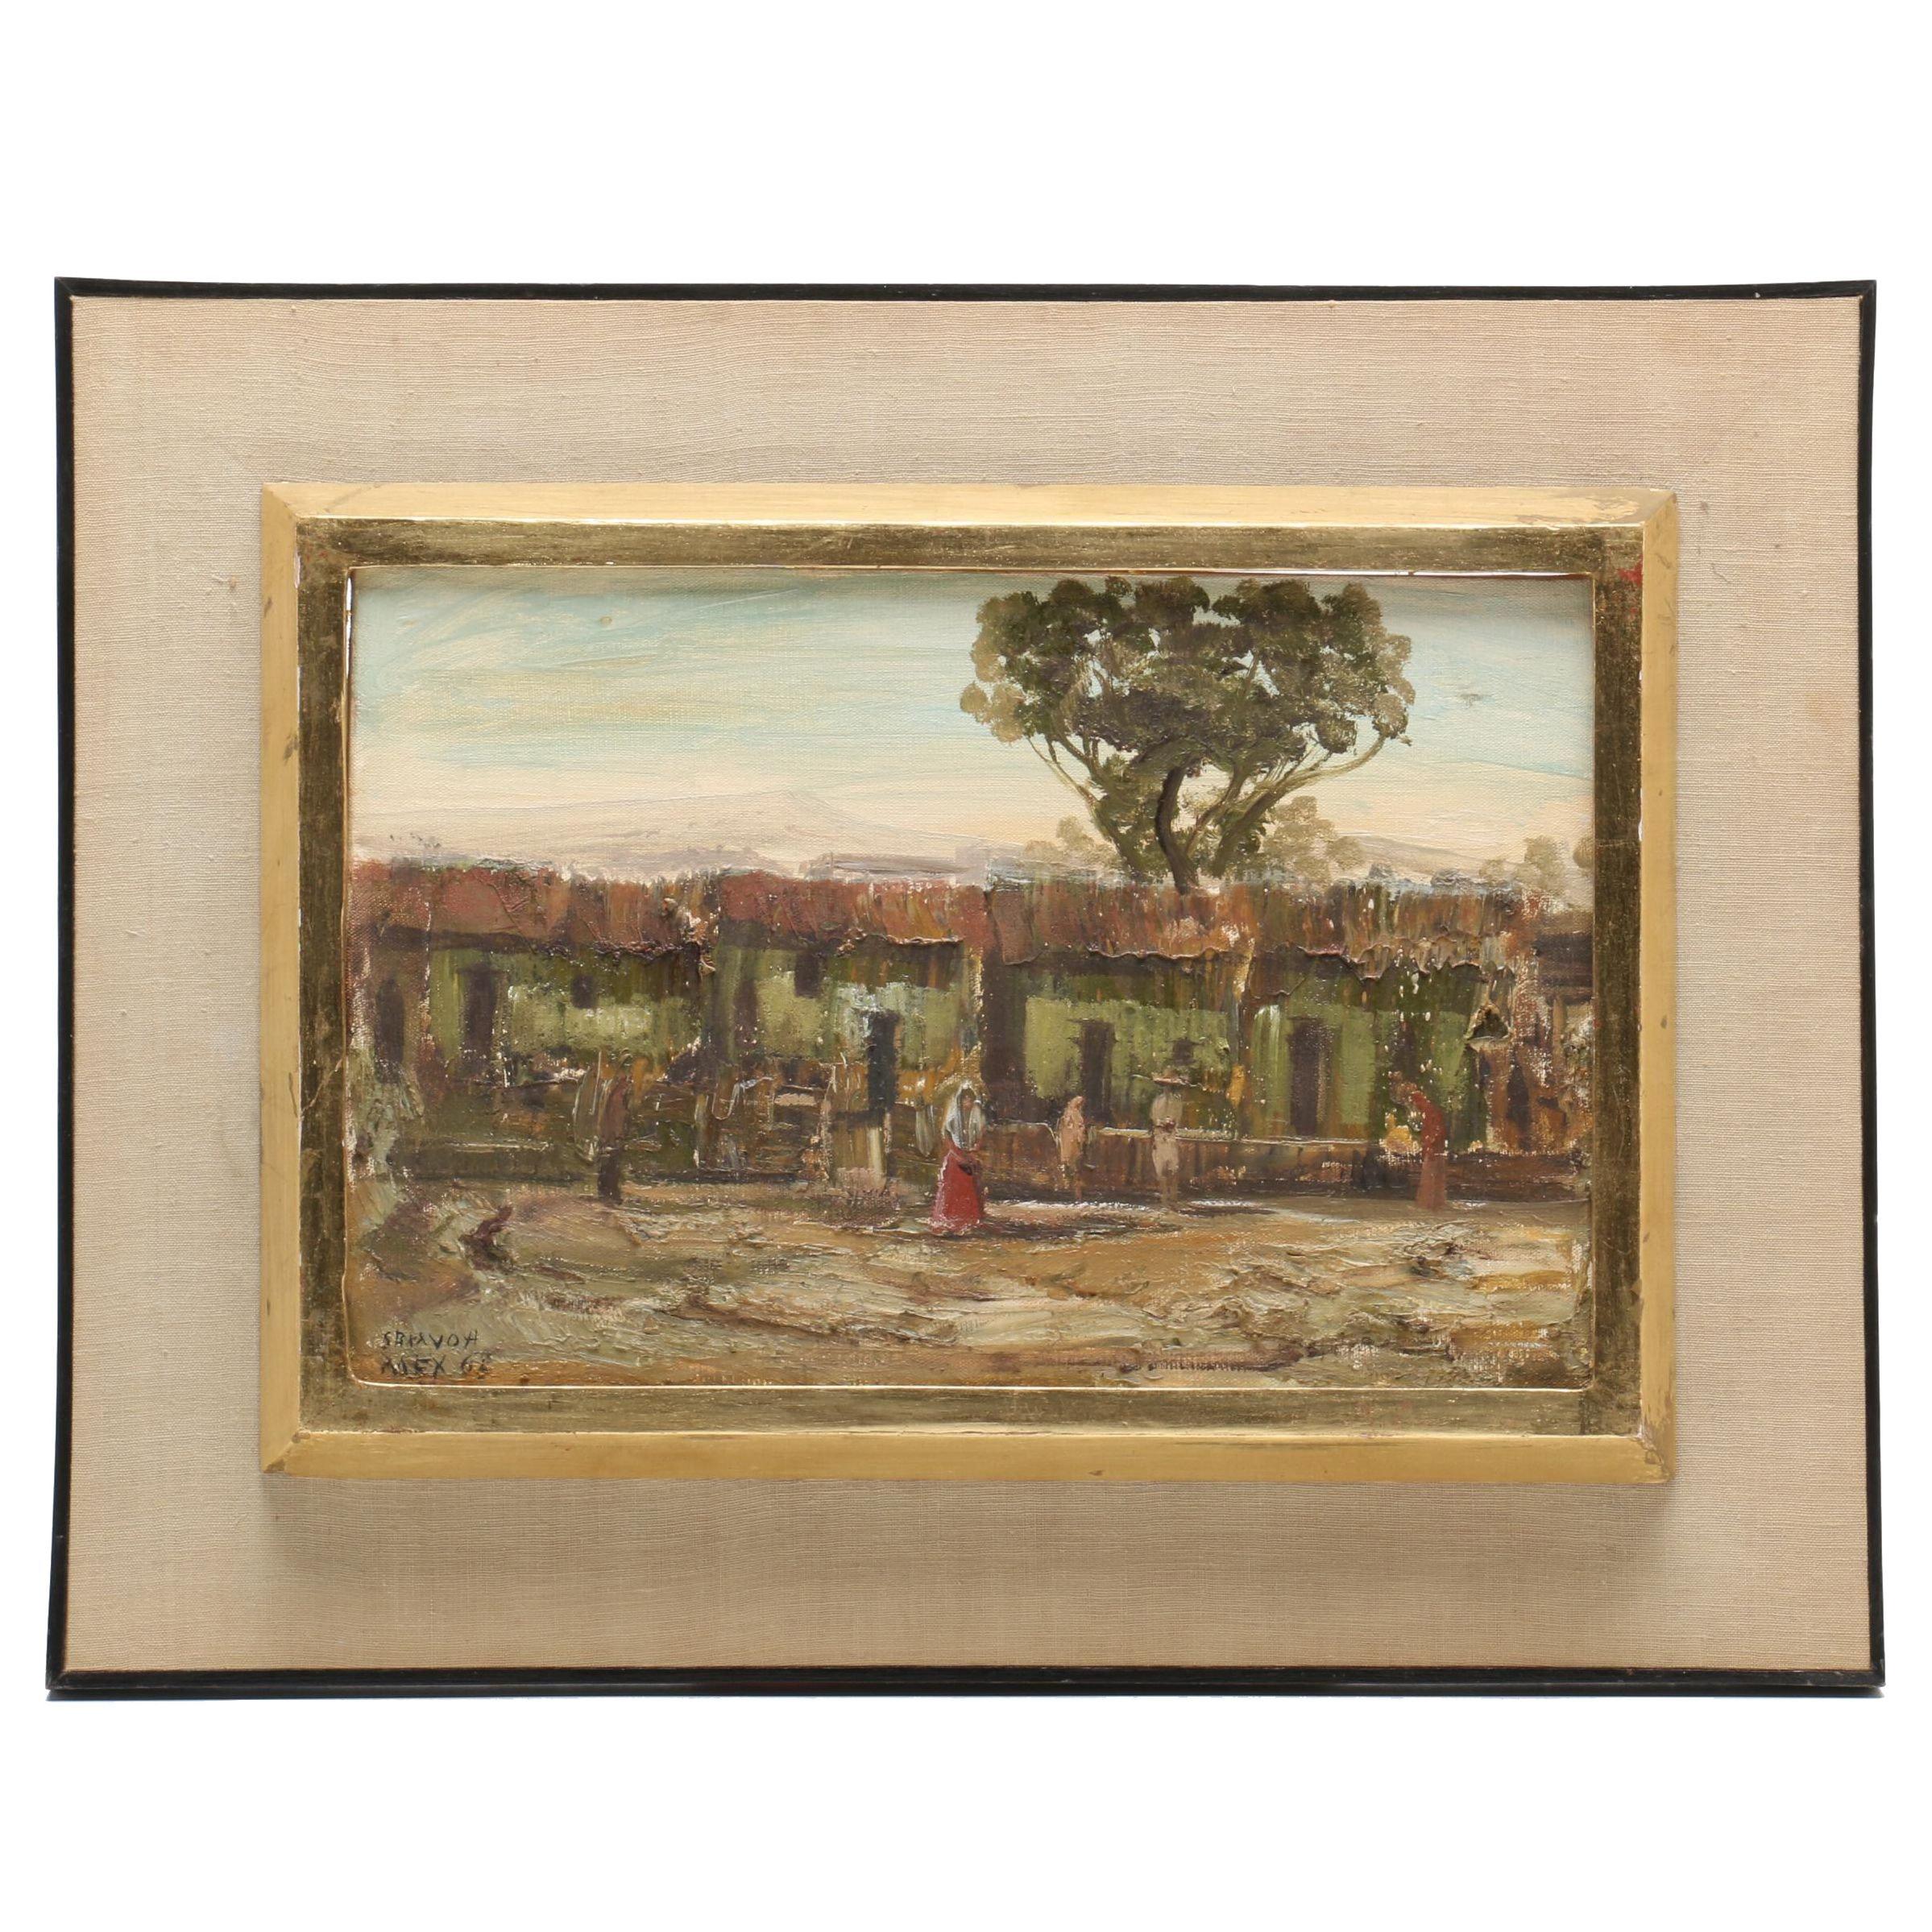 Sergio Bravo Hidalgo Oil Painting of Figures in Courtyard